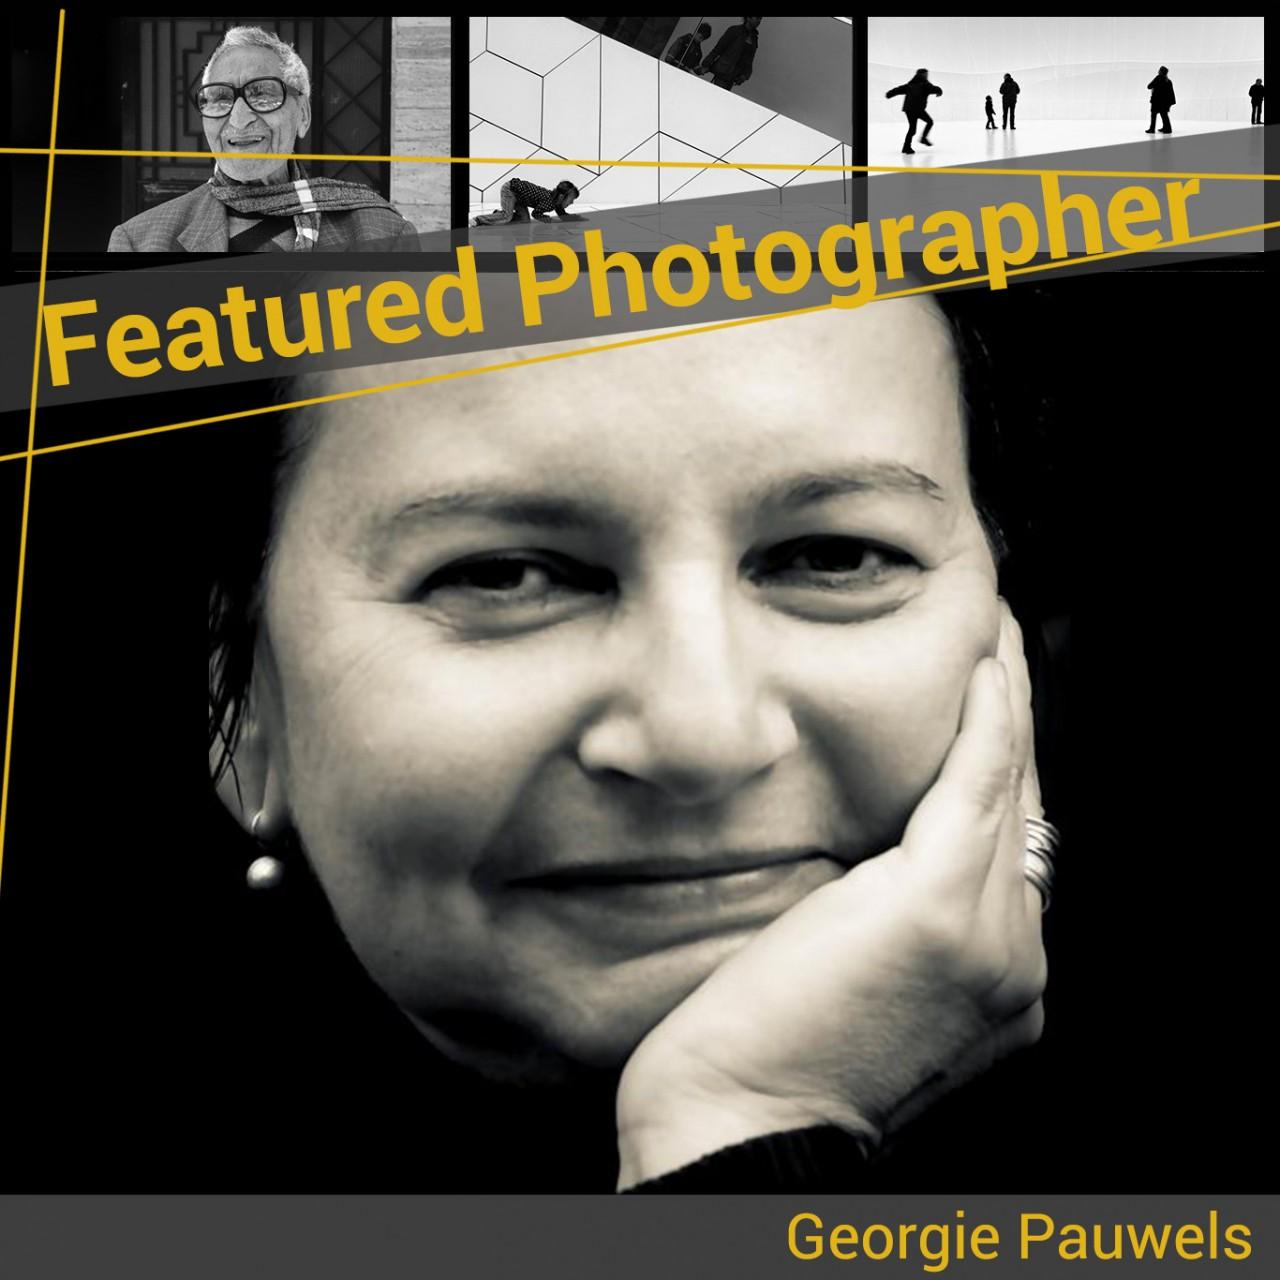 Templatet Featured Photographer